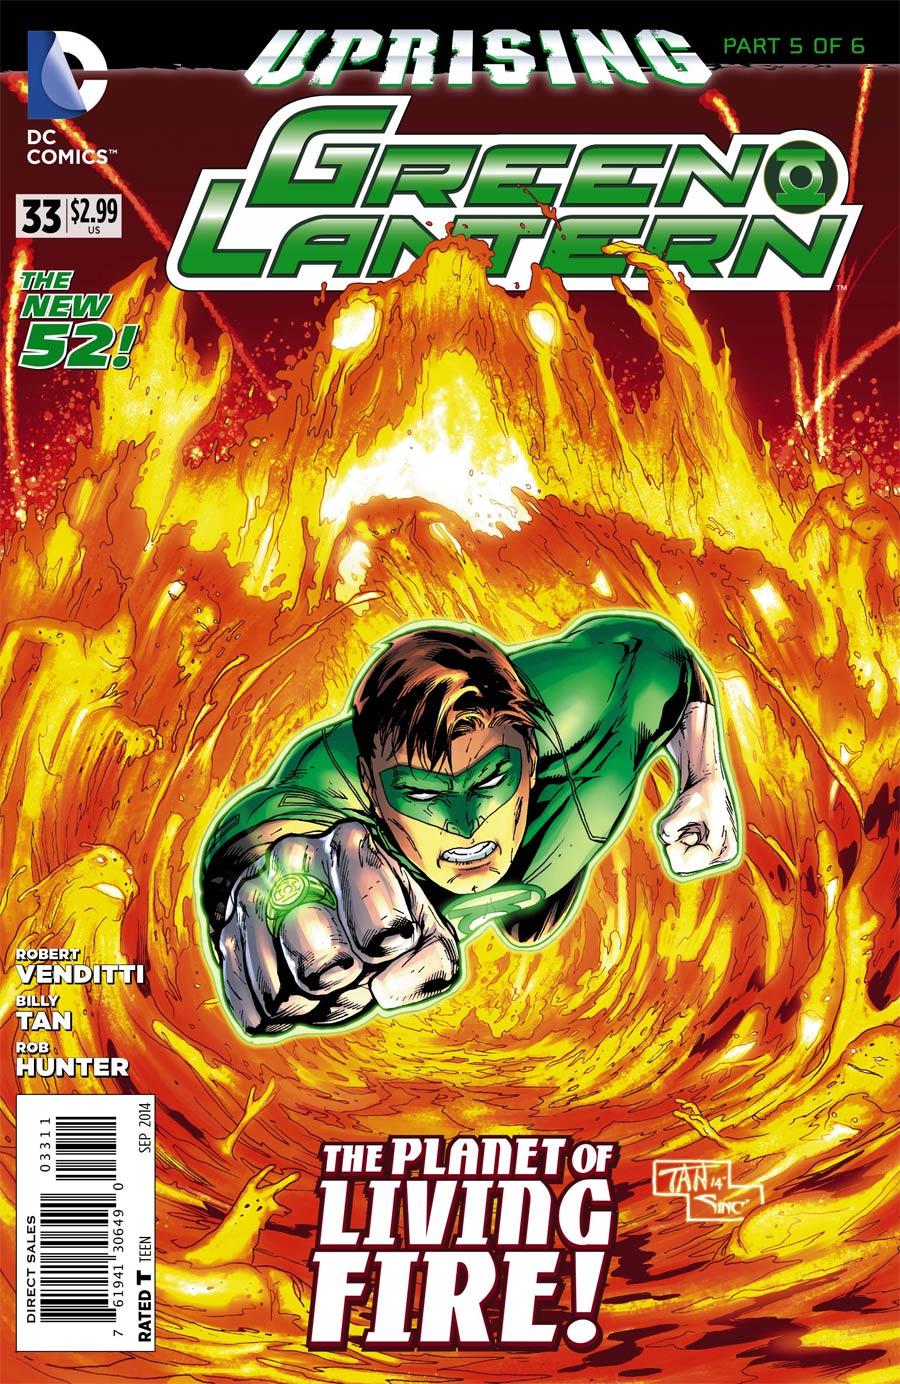 Green Lantern Vol 5 #33 Cover A Regular Billy Tan Cover (Uprising Part 5)